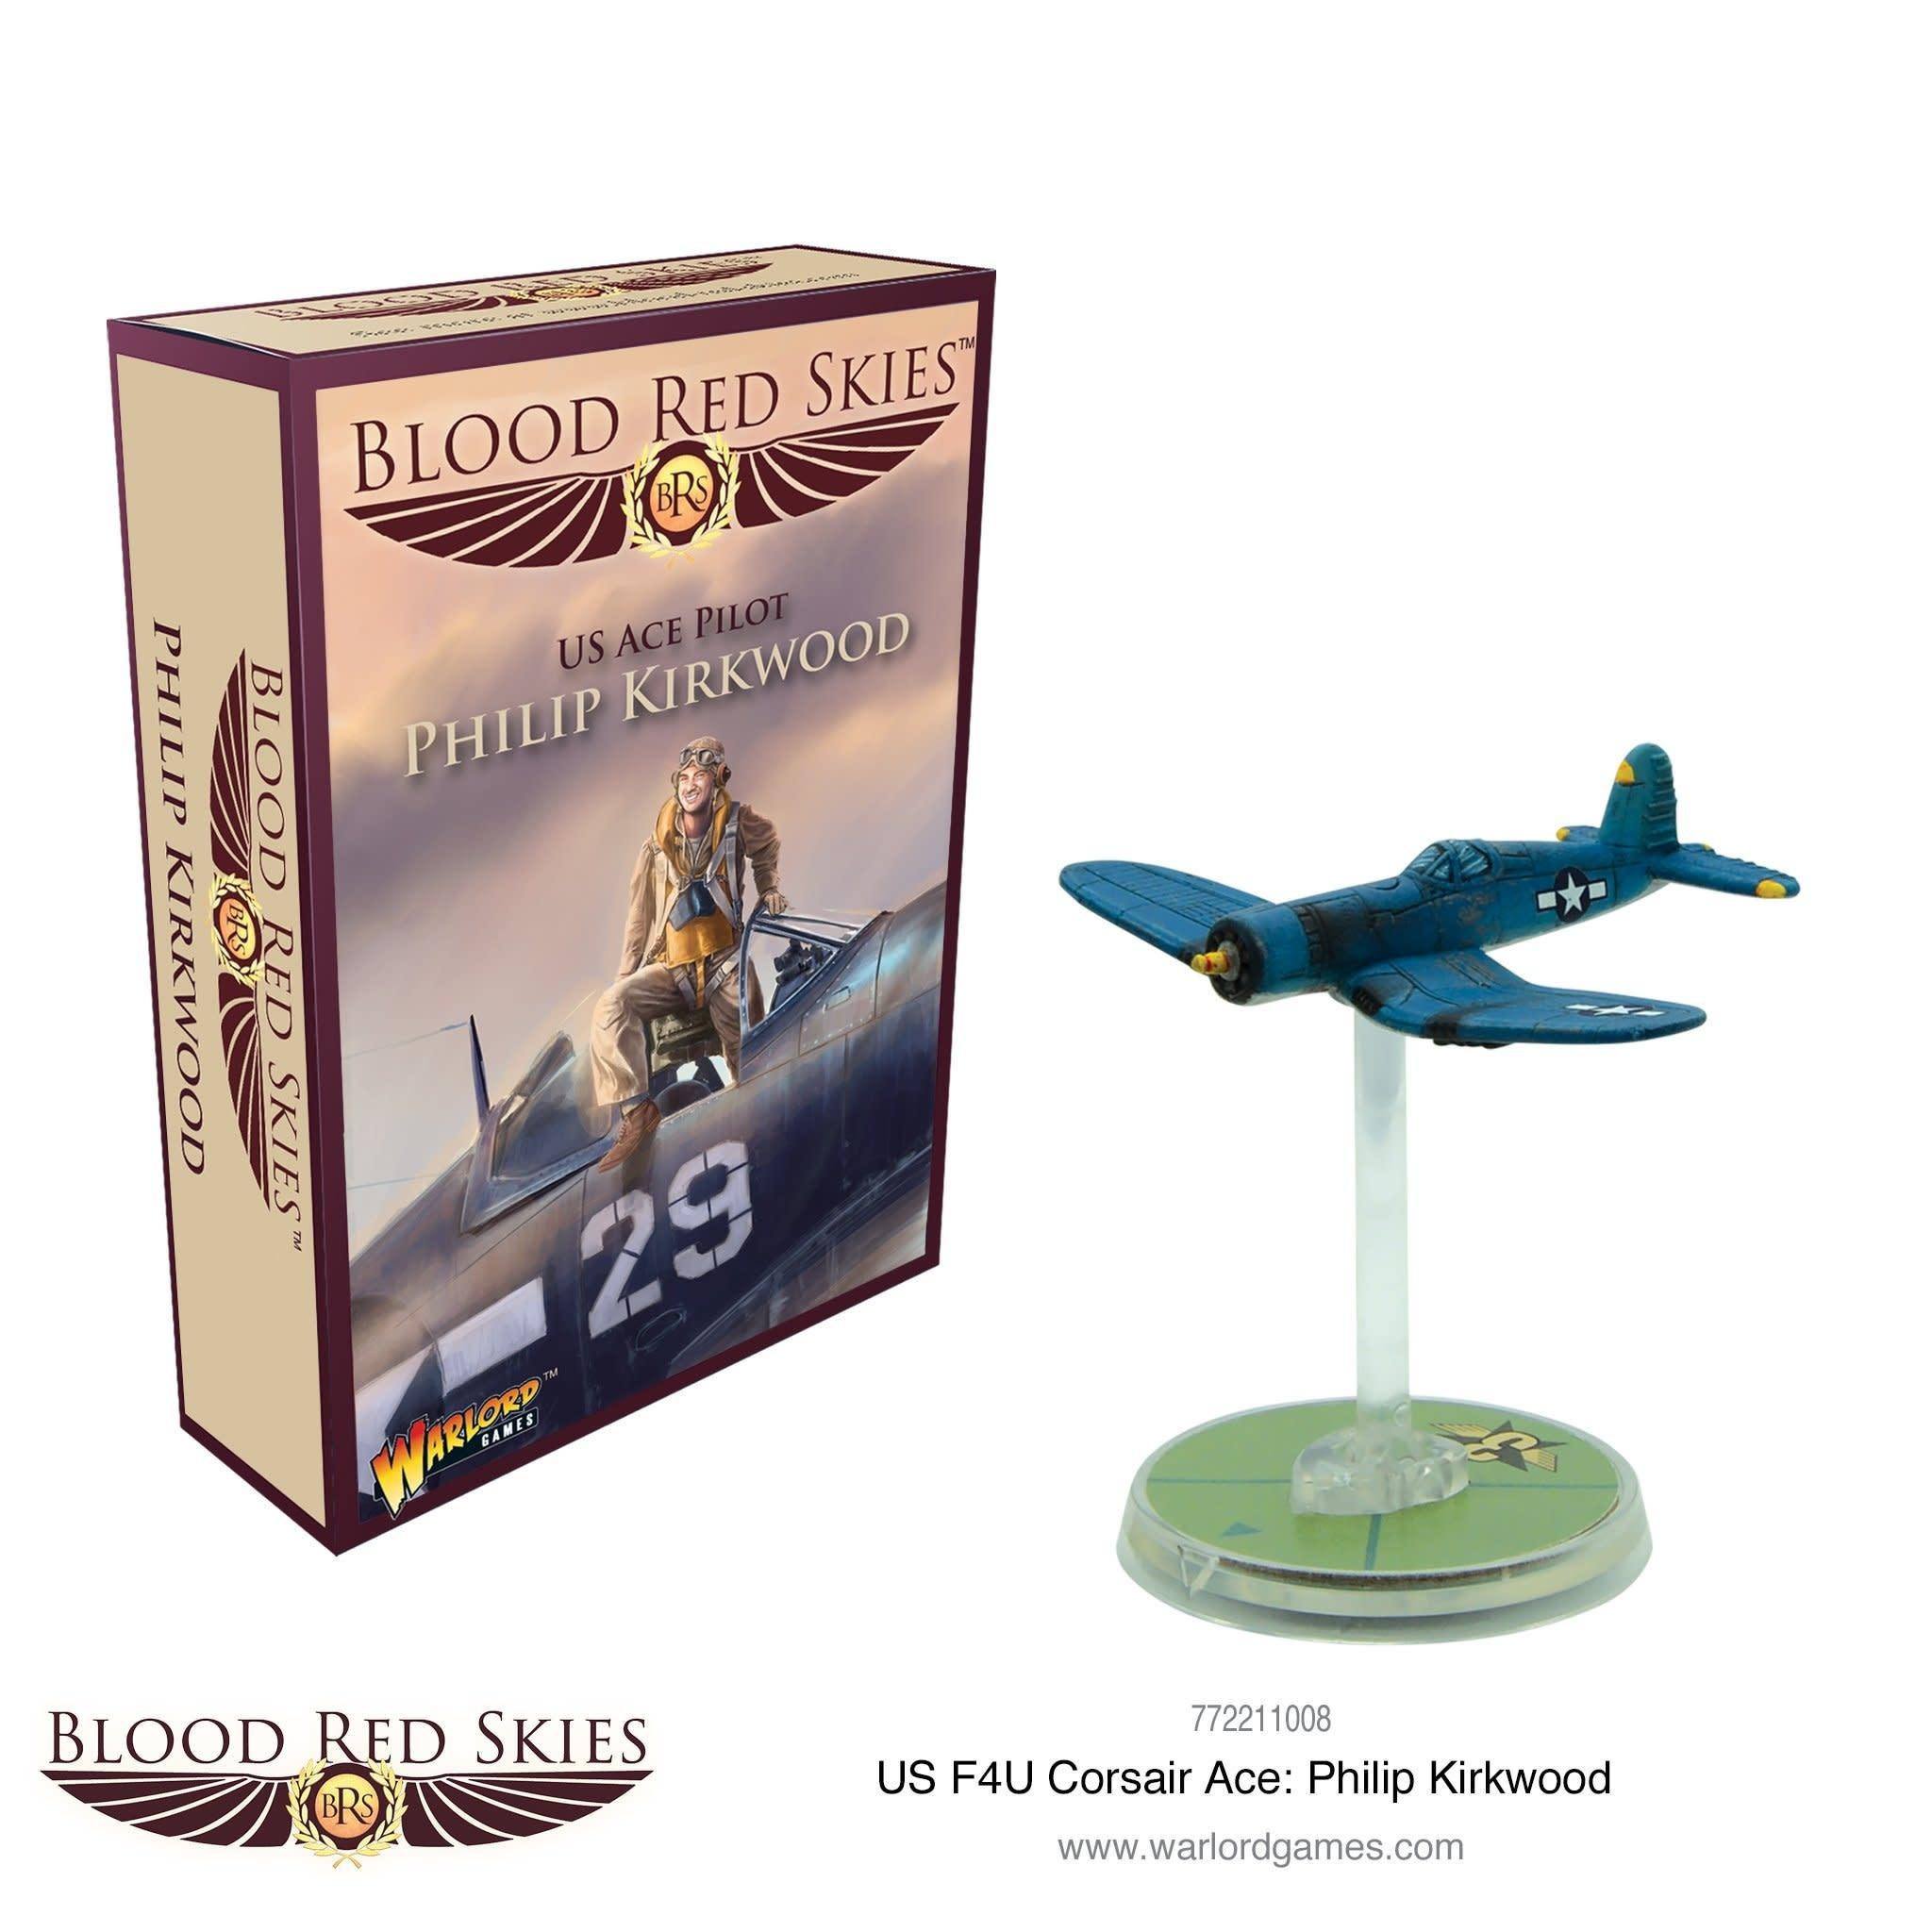 Warlord games Blood Red Skies: American, Ace Pilot Philip Kirkwood